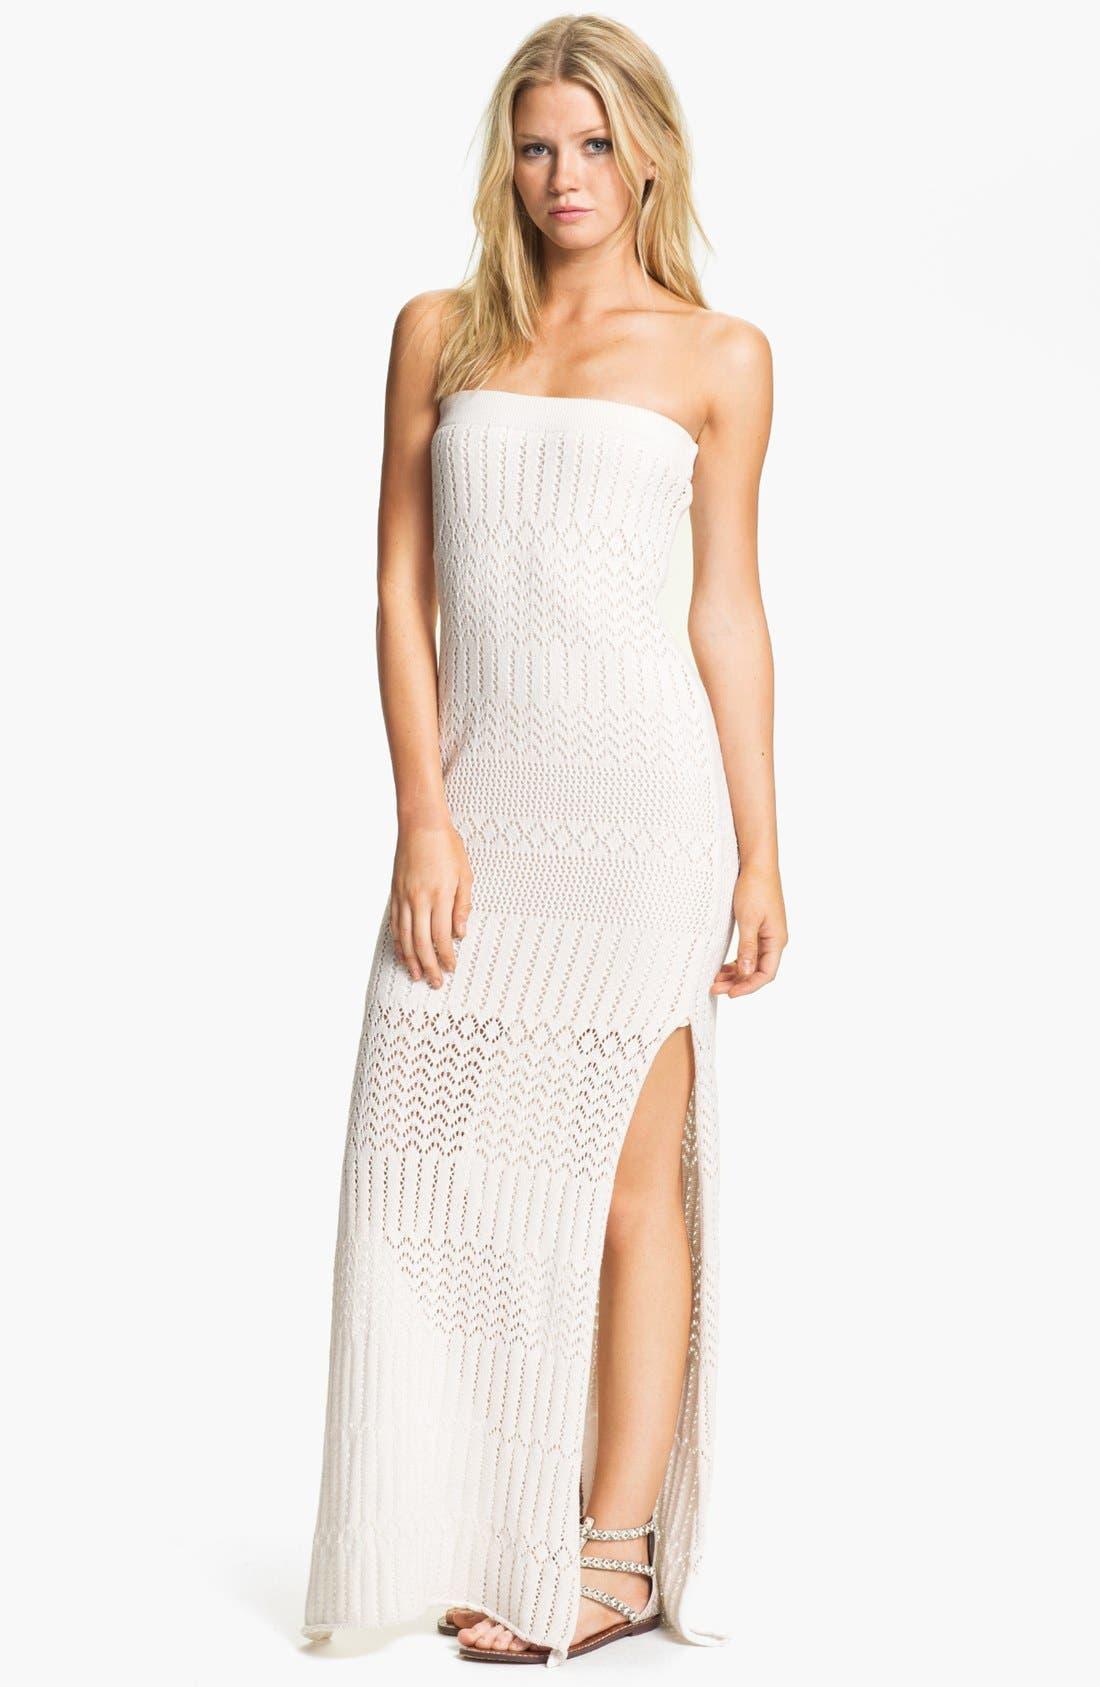 Main Image - Young, Fabulous & Broke 'Lou' Strapless Maxi Dress